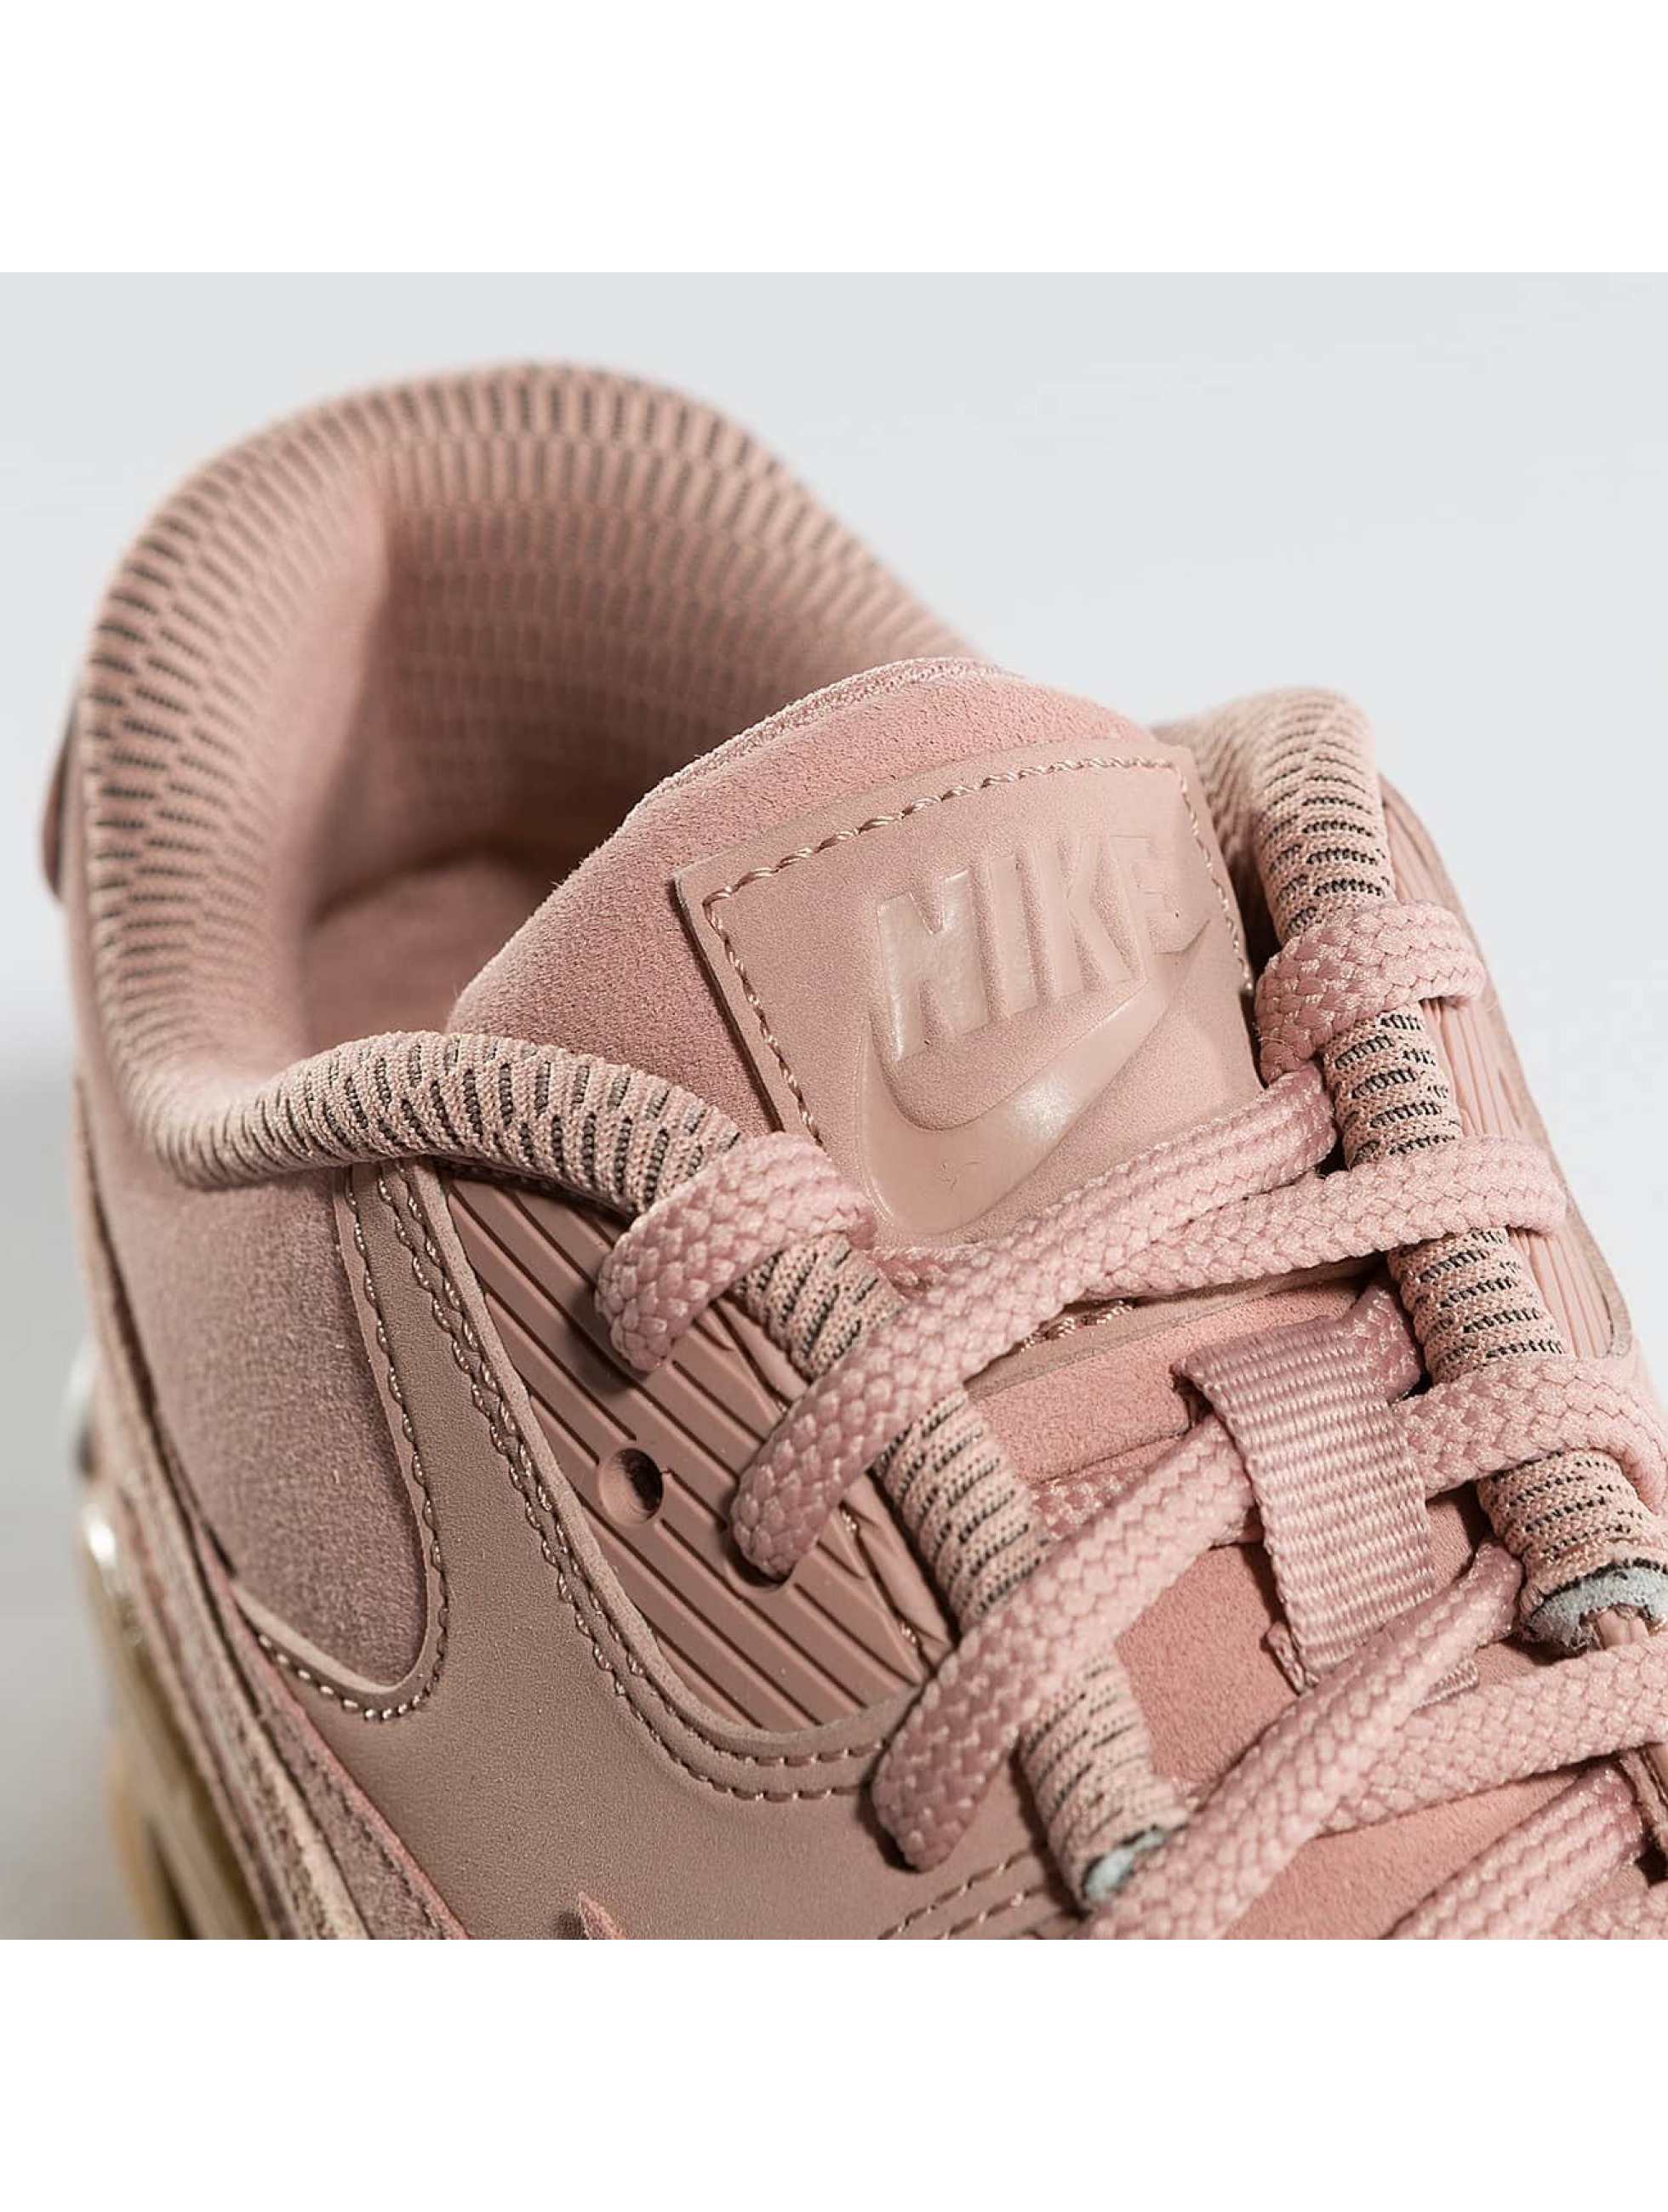 Nike Zapatillas de deporte Air Max 90 SE fucsia